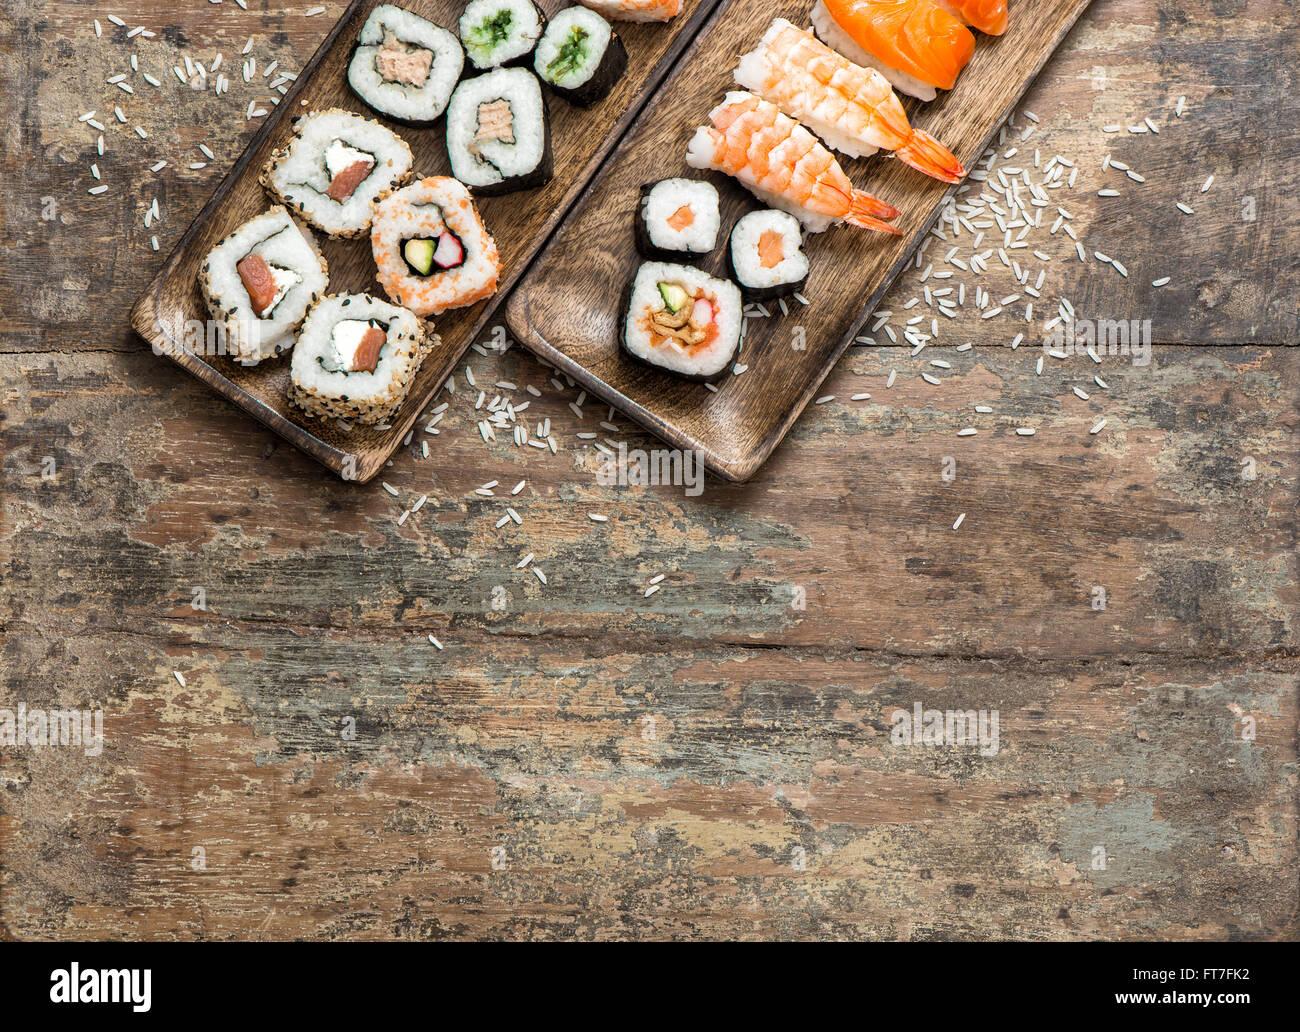 Traditional japanese food. Sushi rolls, maki, nigiri on wooden background - Stock Image